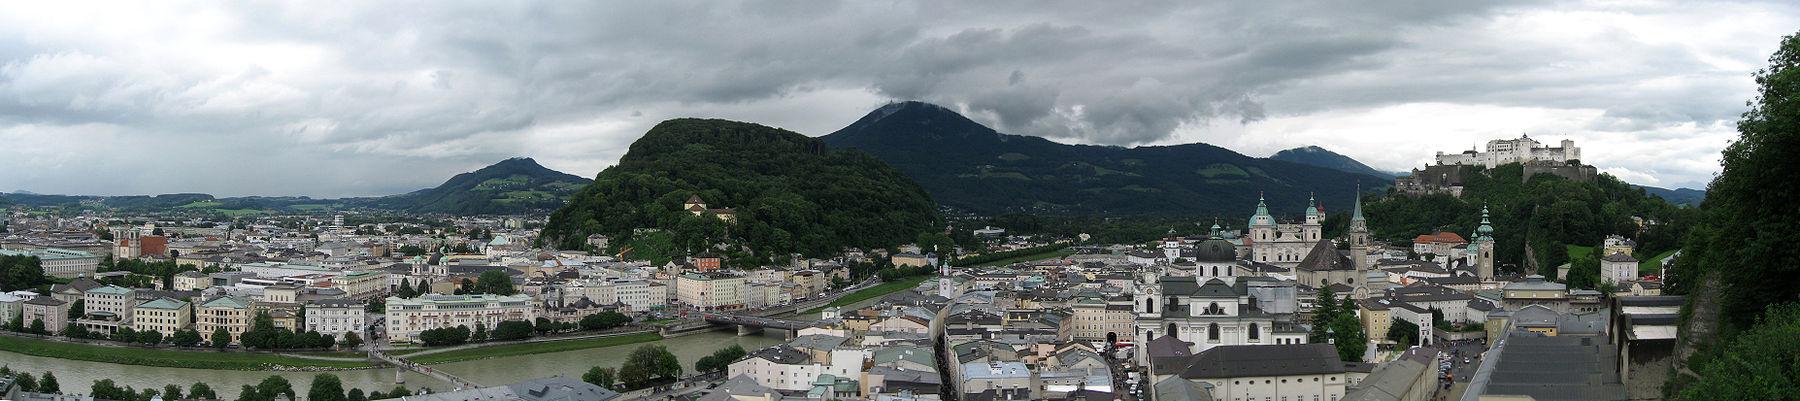 Panoramo de Salzburg